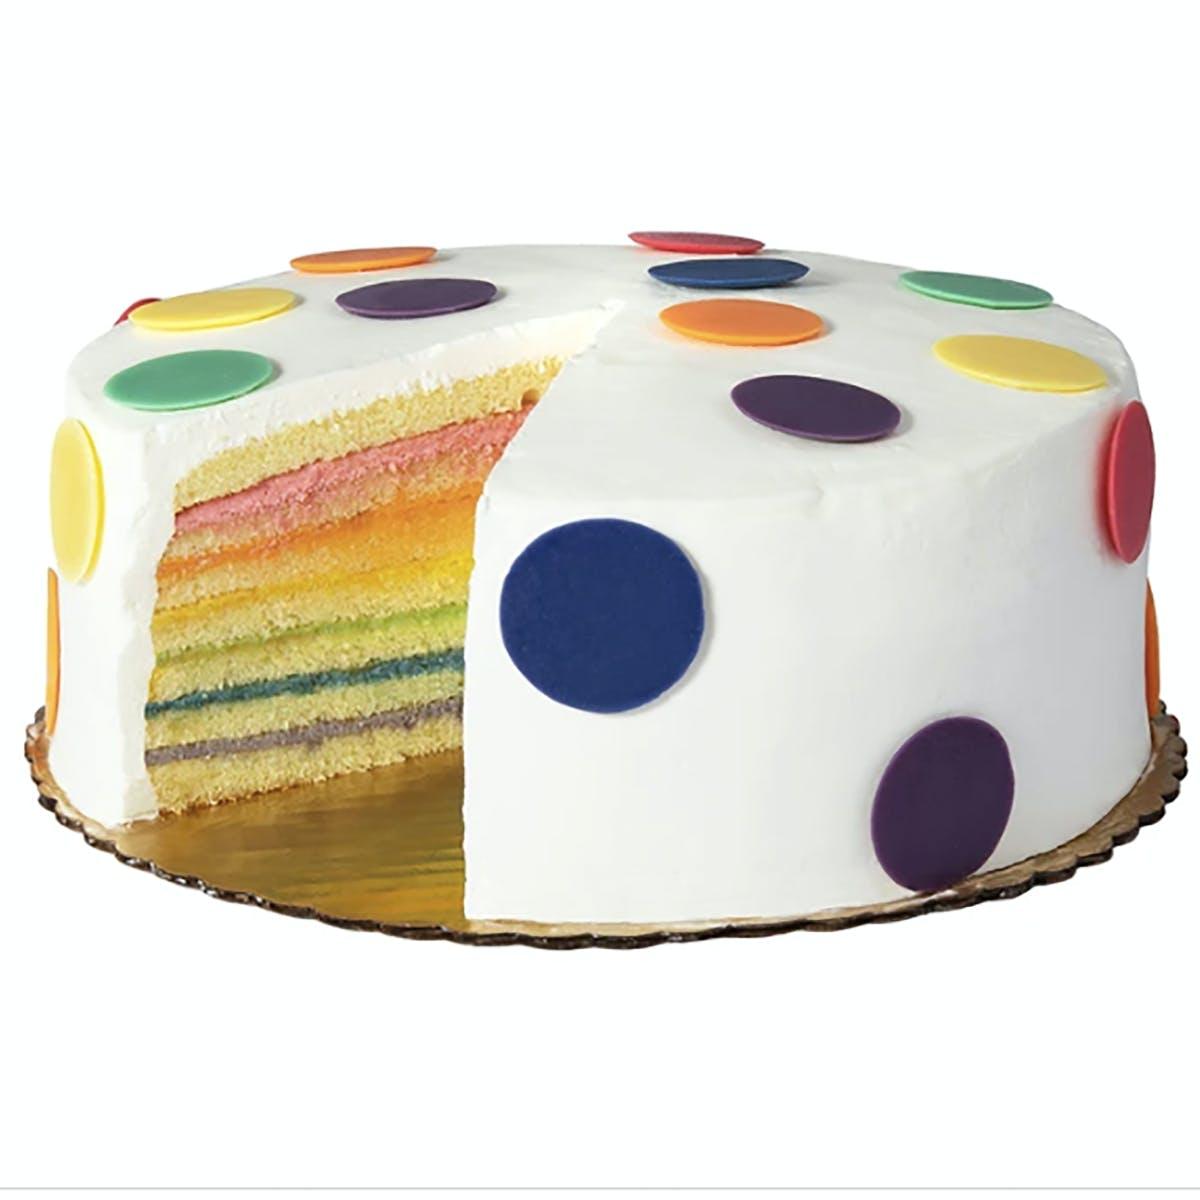 Astonishing Happy Birthday Rainbow Cake By Carolines Cakes Goldbelly Funny Birthday Cards Online Hendilapandamsfinfo